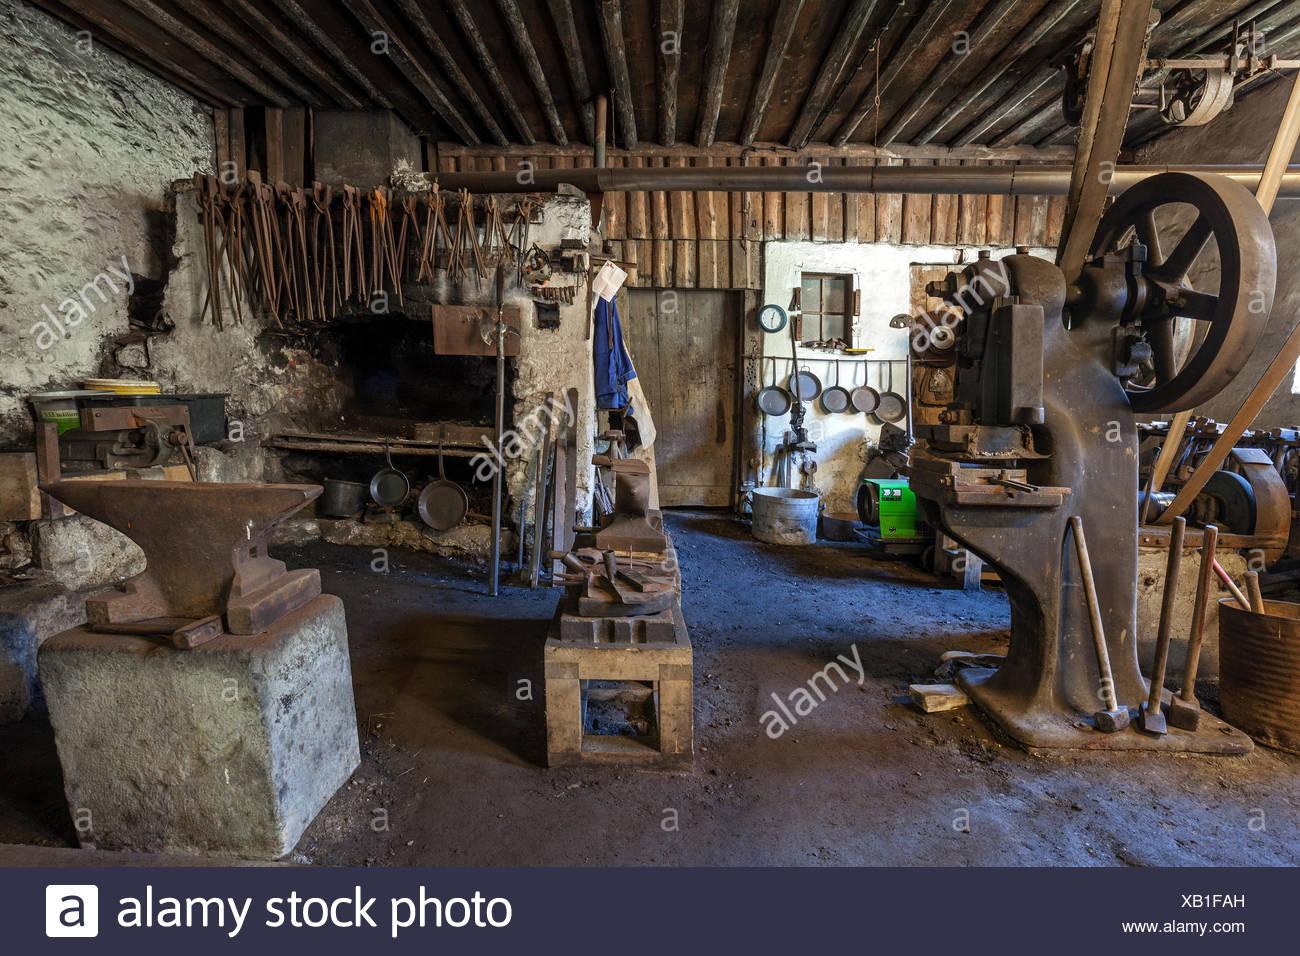 Interior, workshop, old hammer mill at the Ostrach, Obere Hammerschmiede, Bad Oberdorf in Bad Hindelang, Allgäu, Bavaria - Stock Image